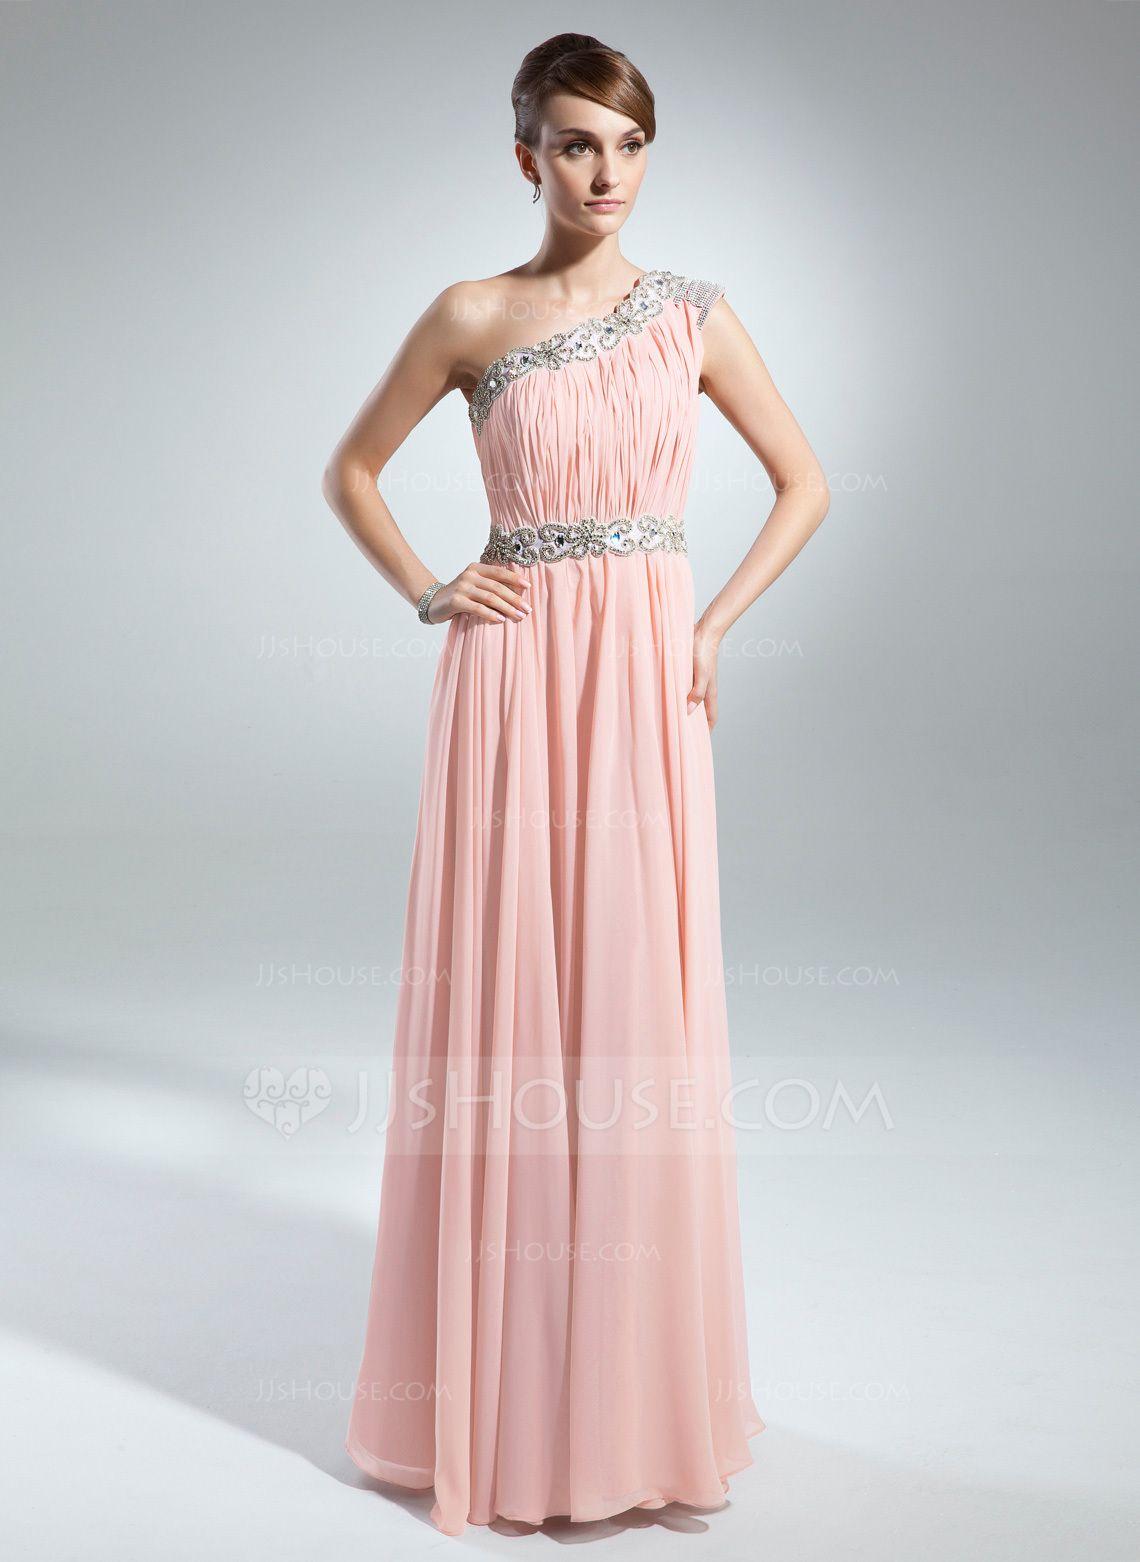 JJsHouse Holiday Dresses